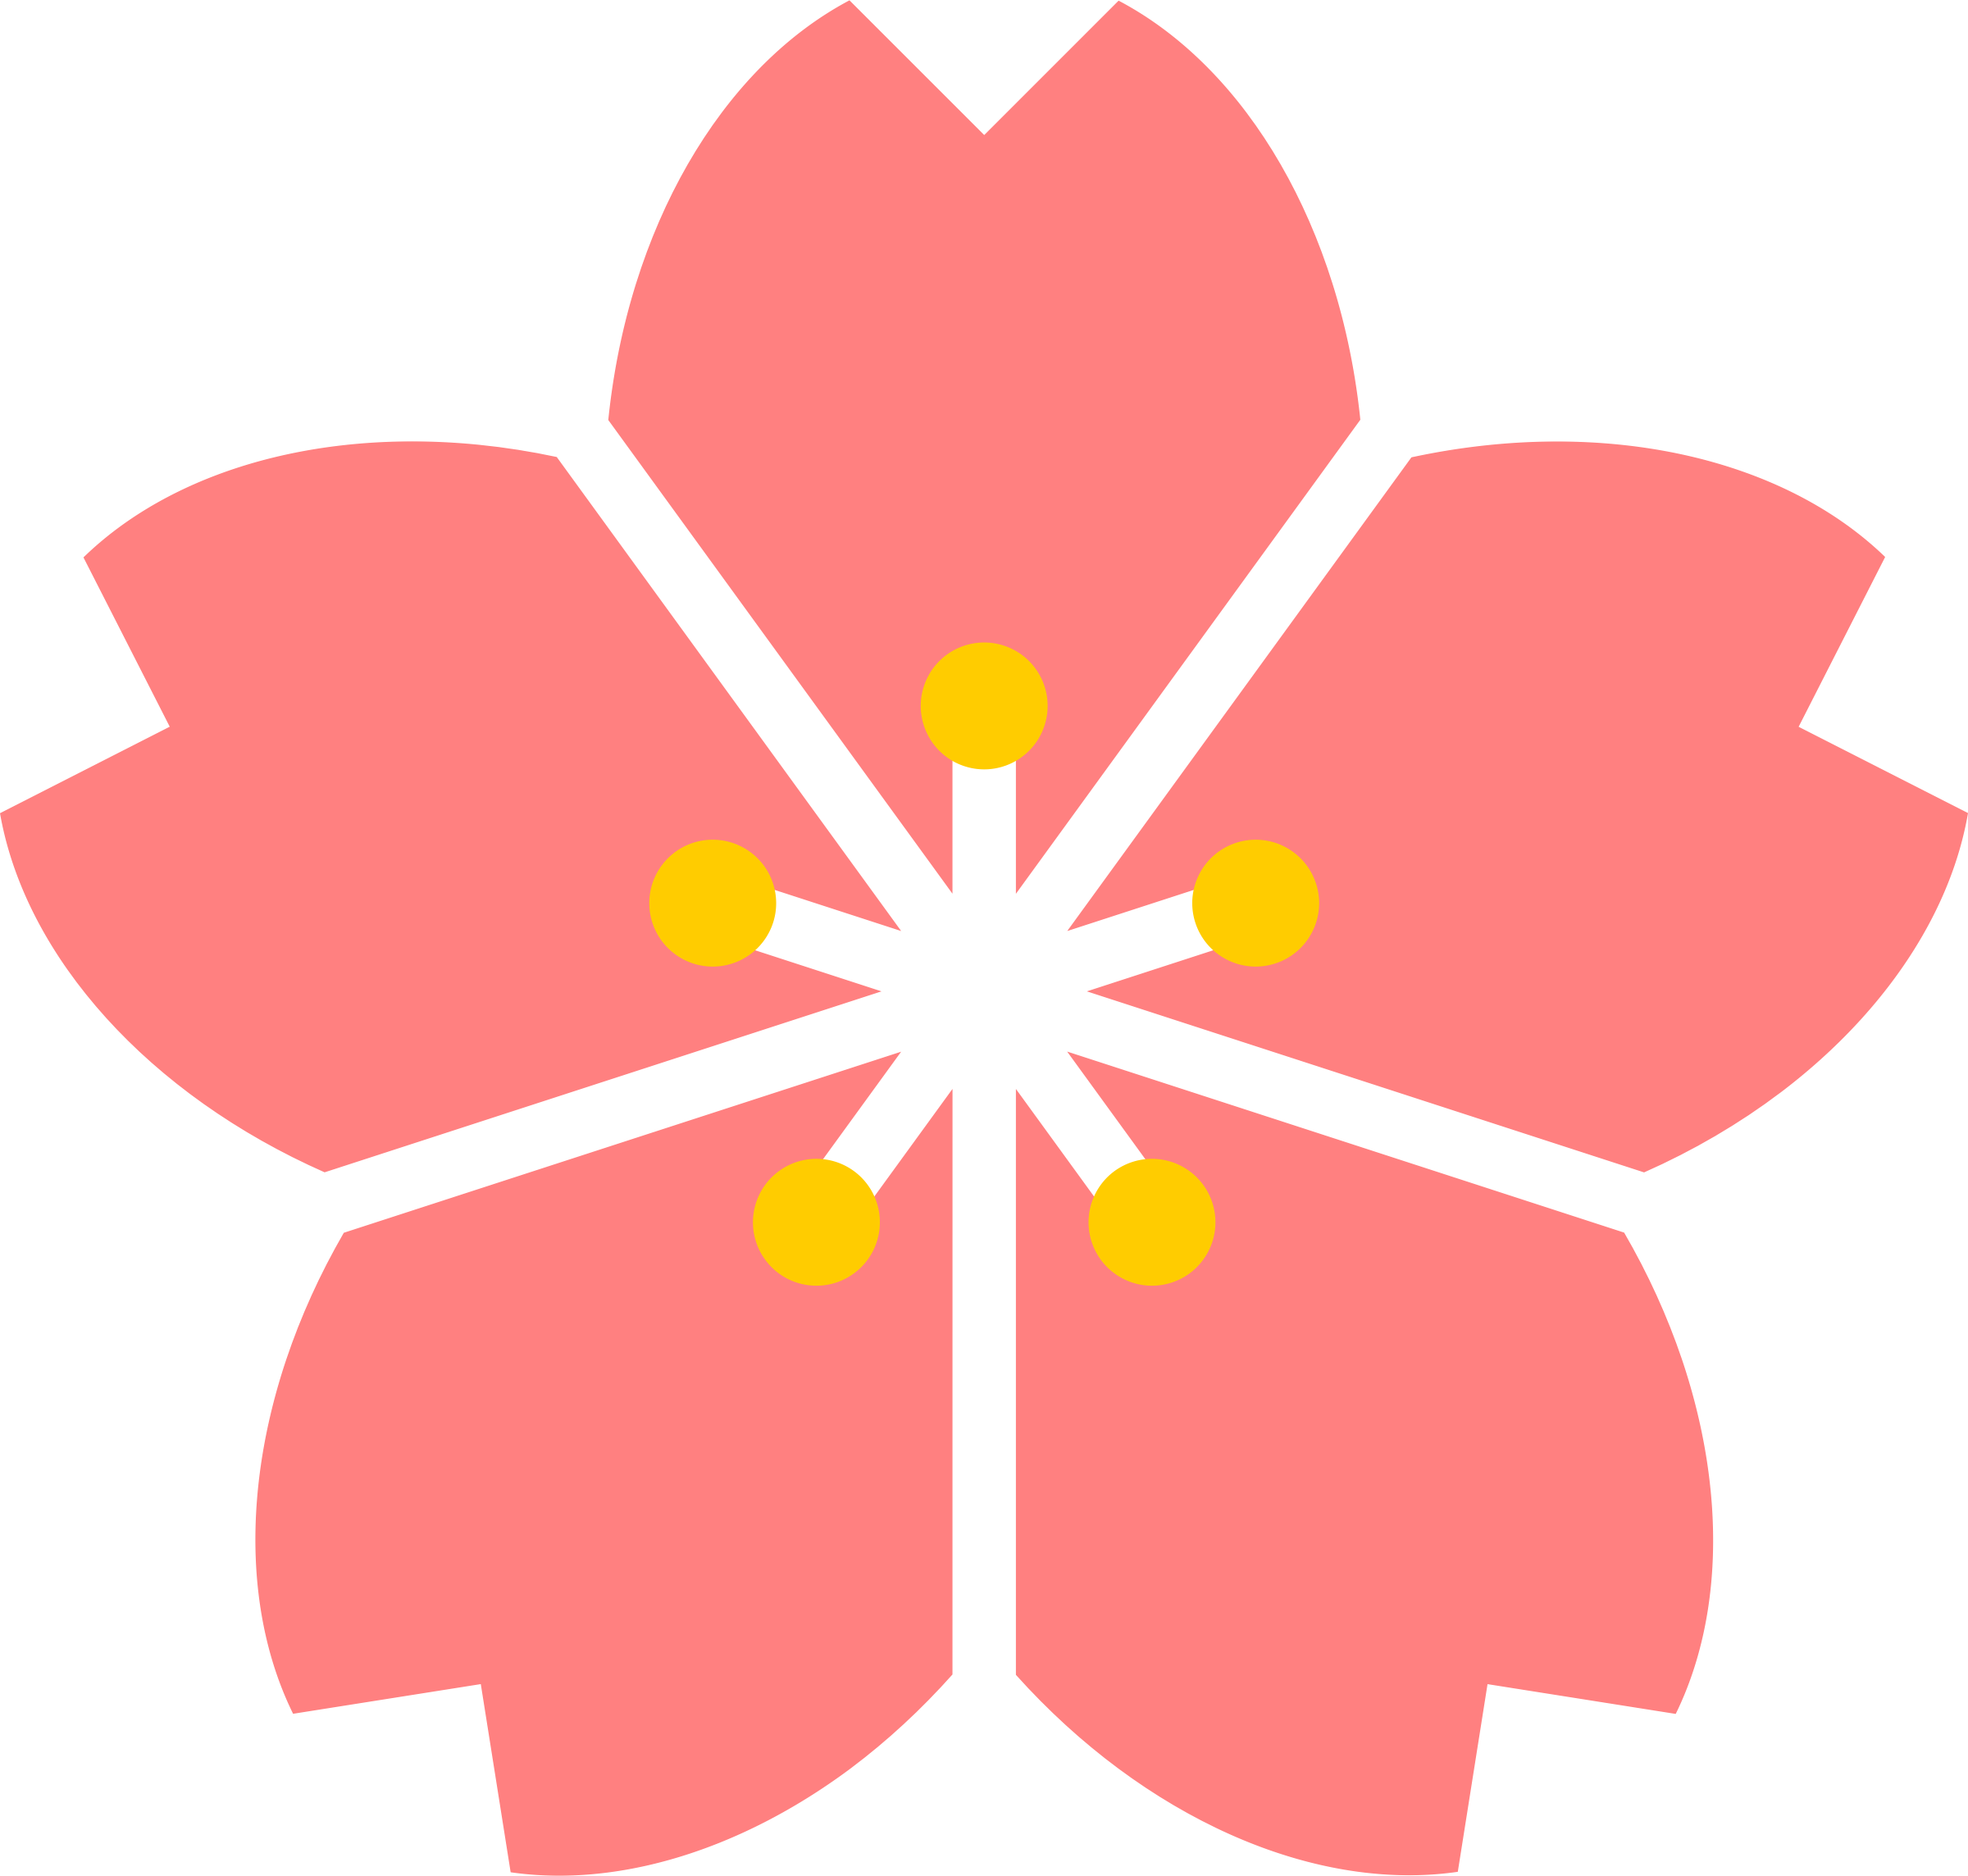 Sakura Blossom clipart sakura flower #12